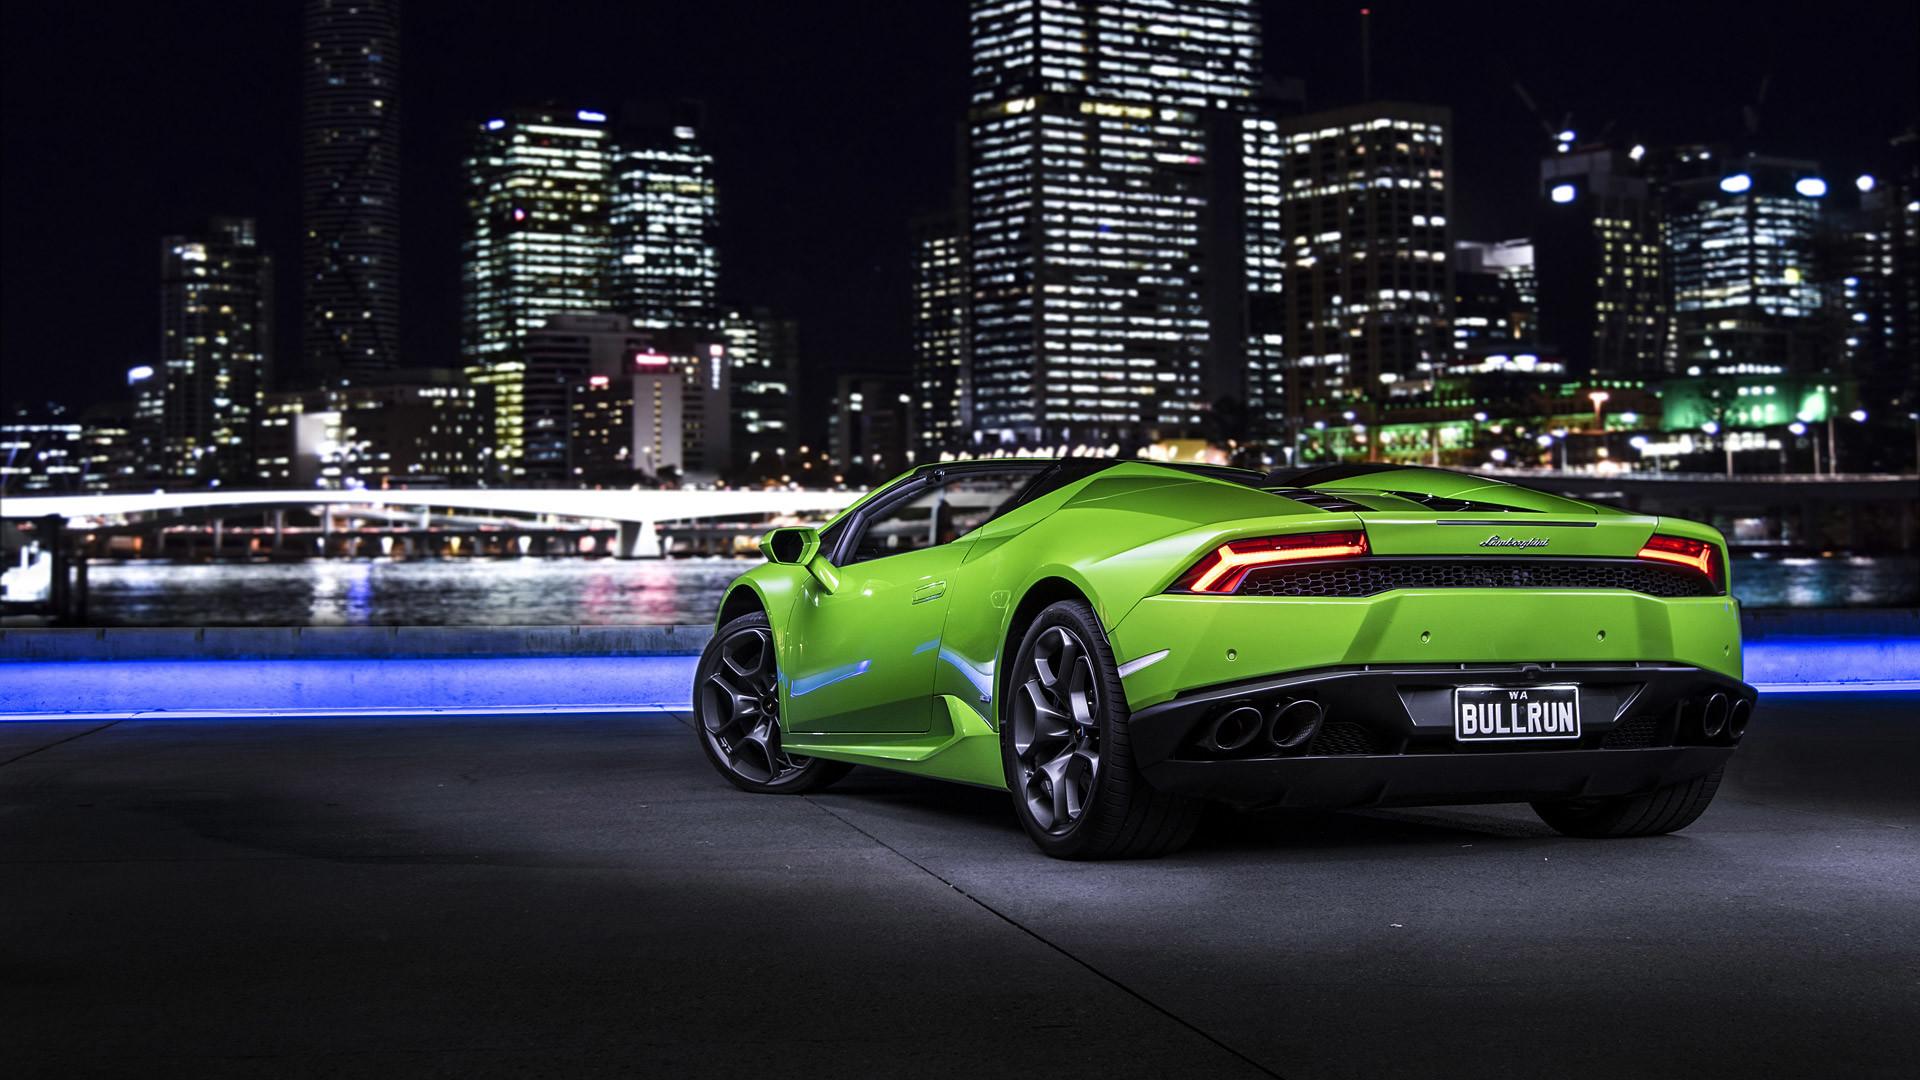 2017 Lamborghini Huracan LP610-4 Spyder Wallpapers & HD .